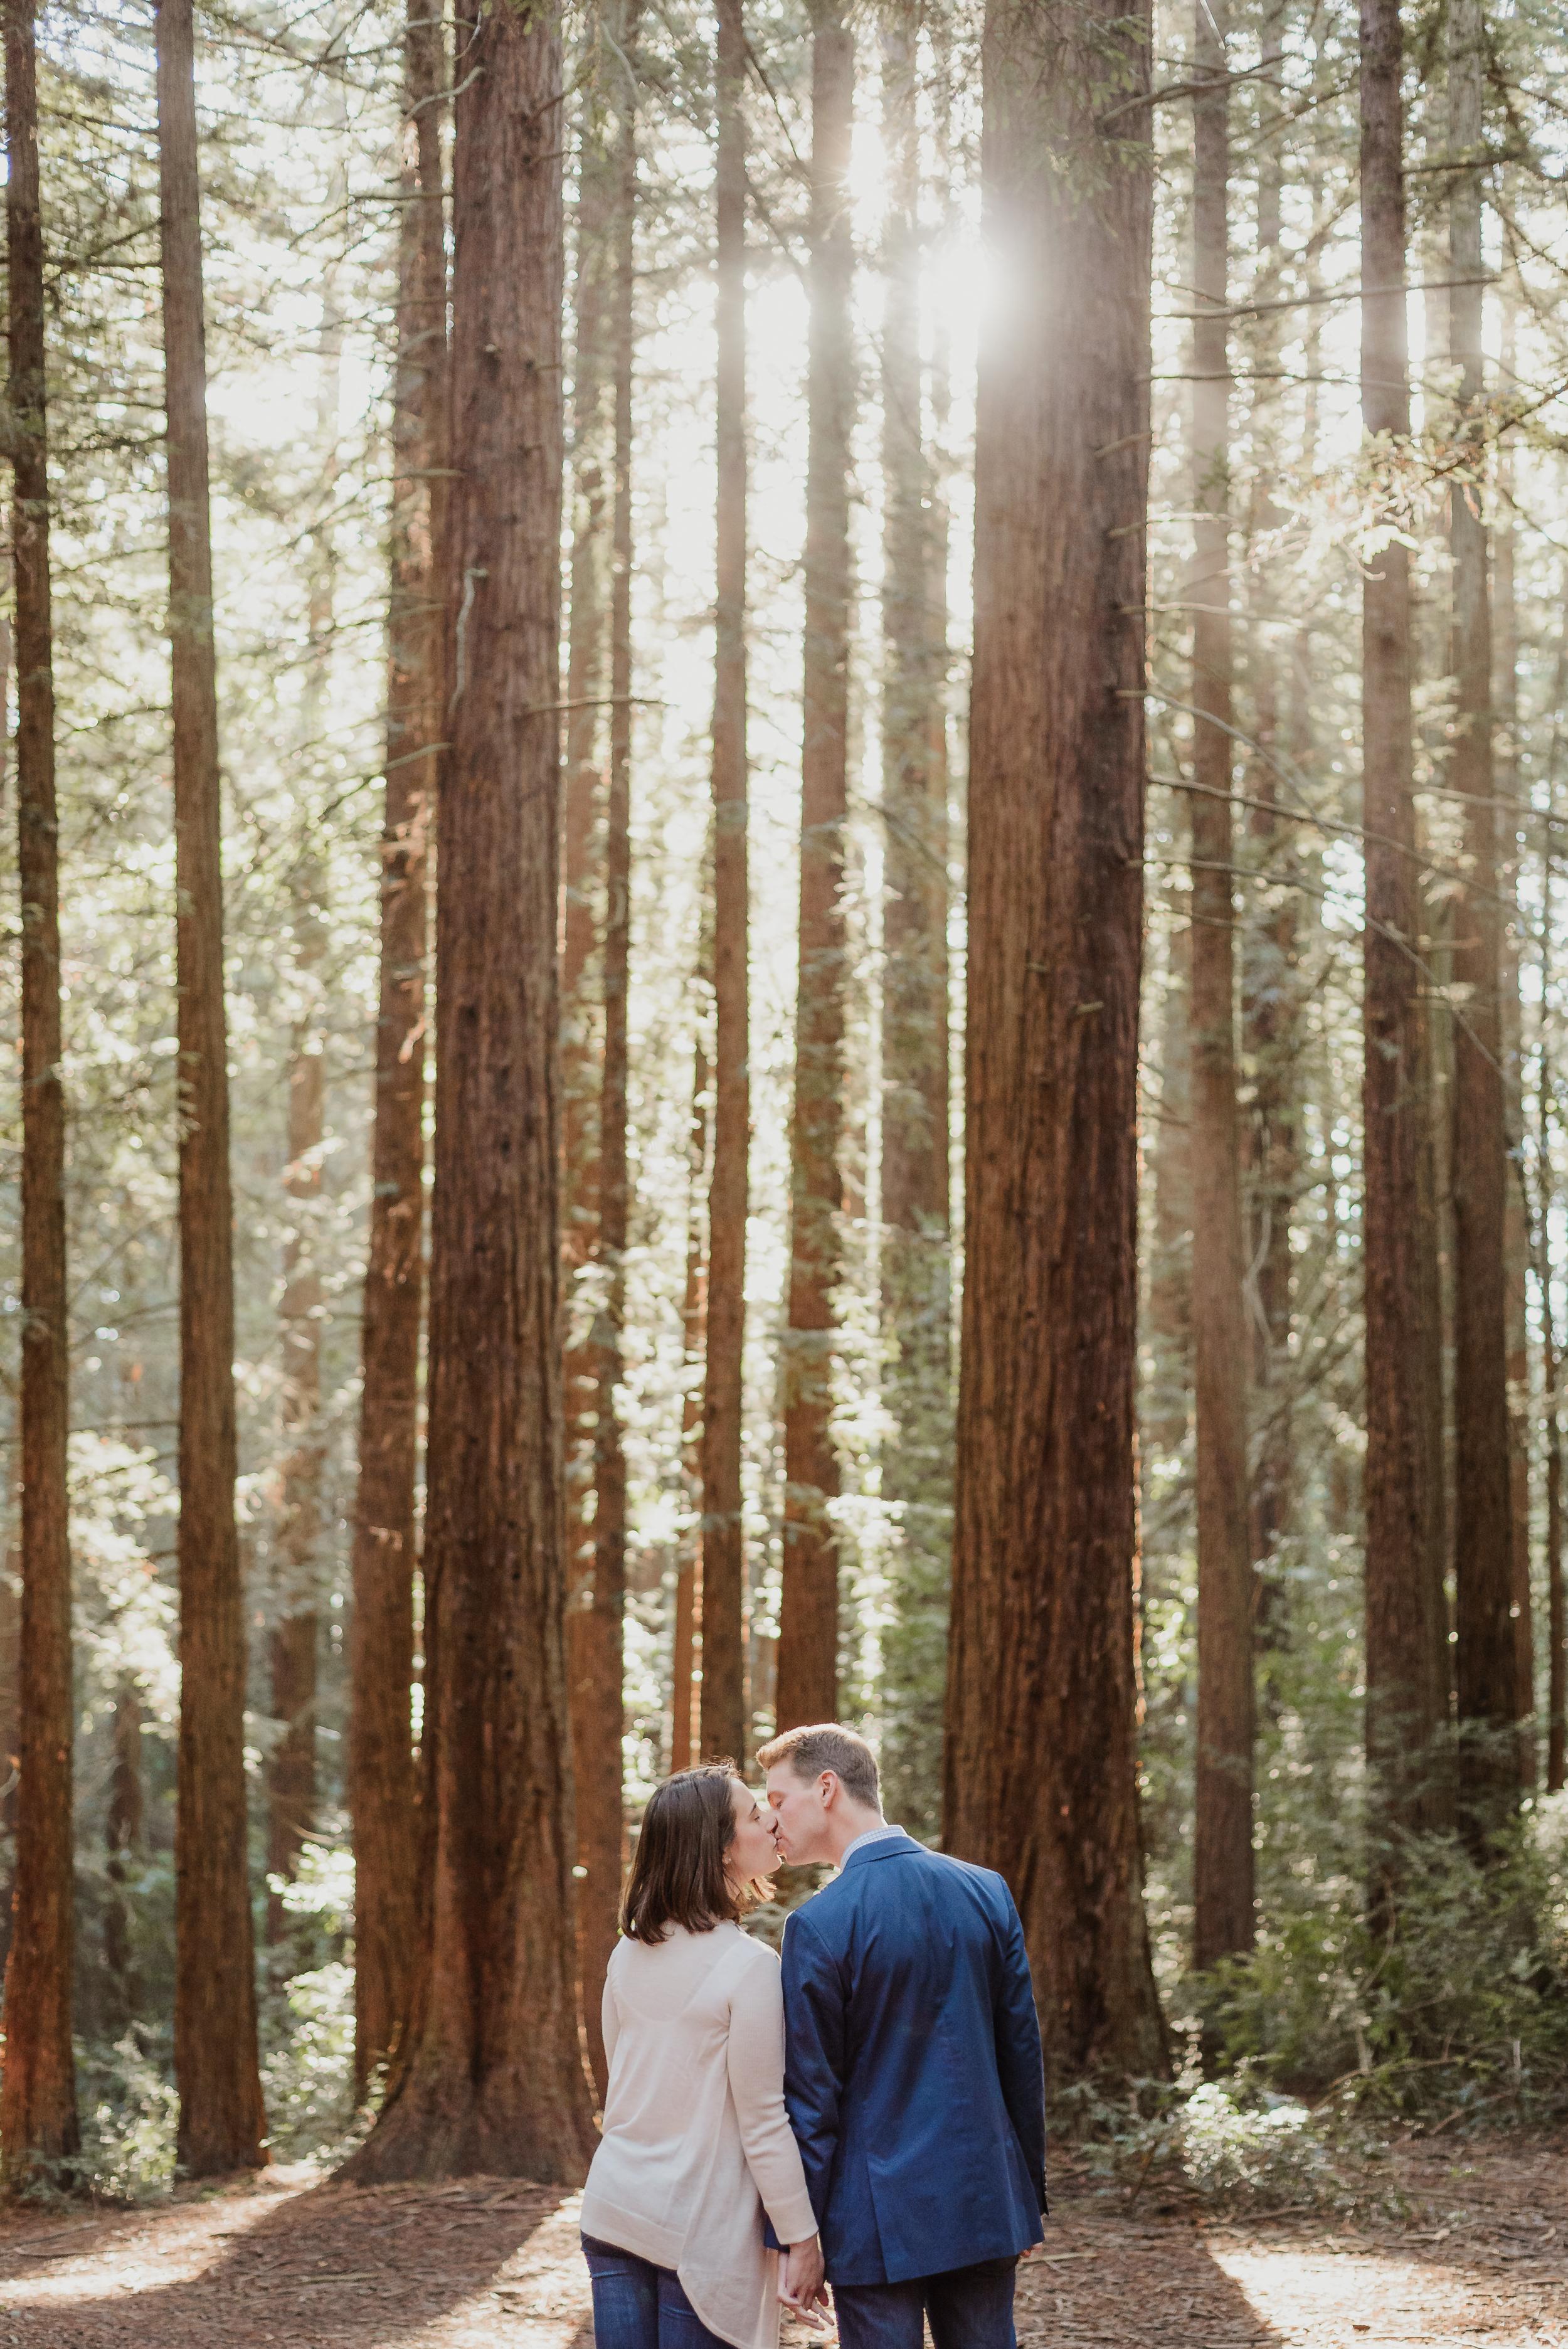 oakland-redwood-regional-park-engagement-session-mr-vivianchen-018.jpg